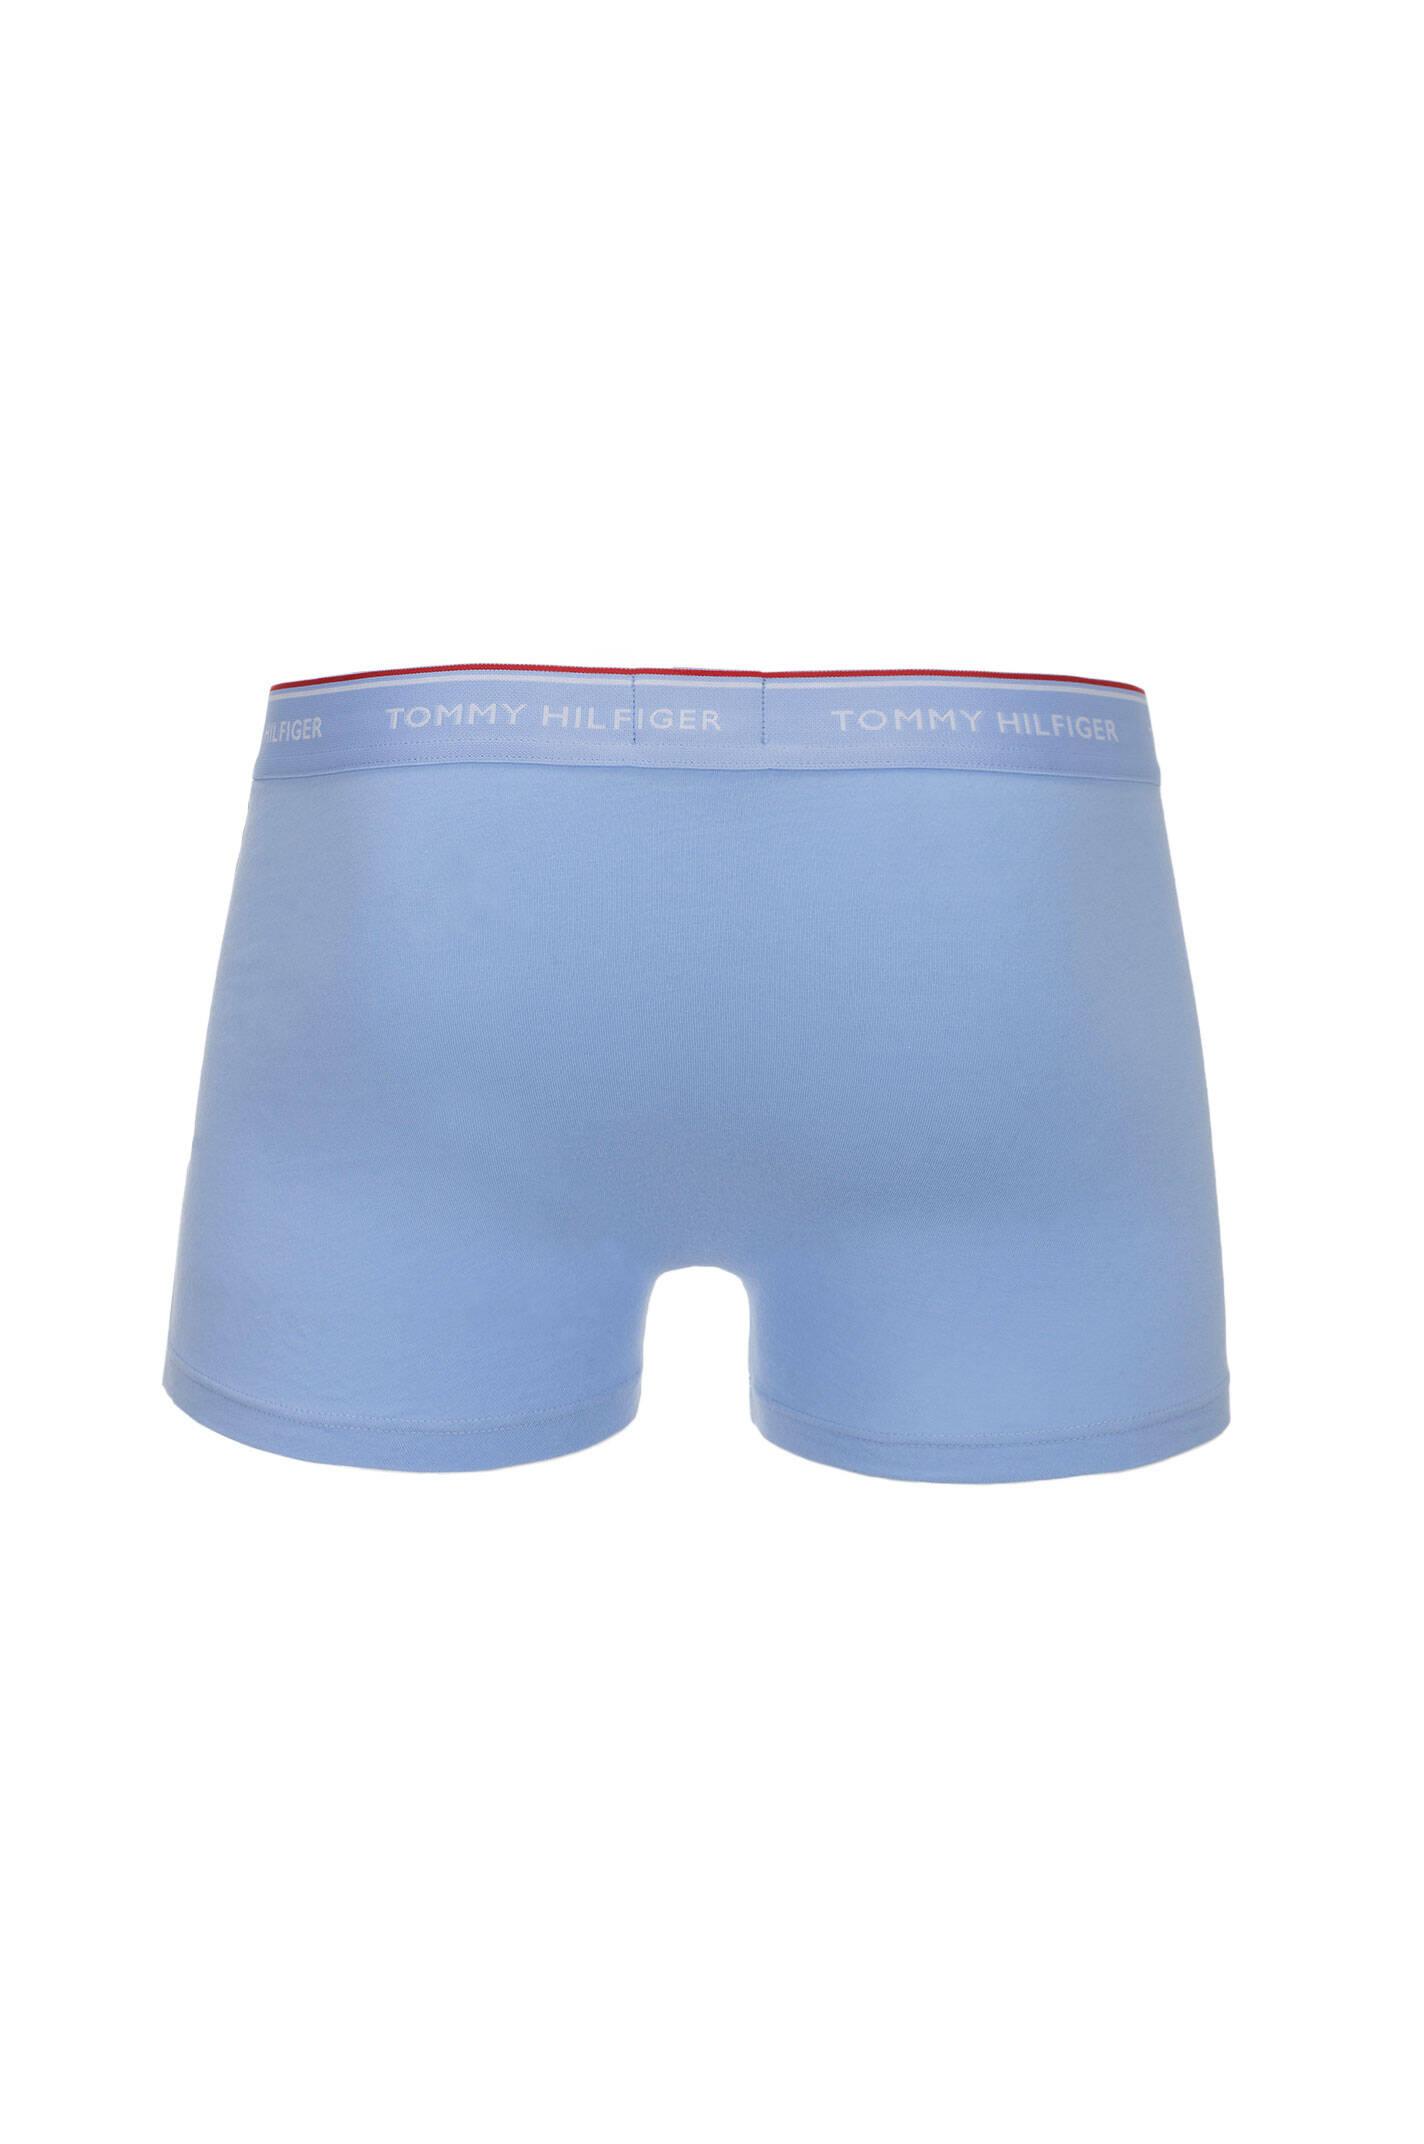 premium essentials 3 pack boxer shorts tommy hilfiger baby blue underwear. Black Bedroom Furniture Sets. Home Design Ideas